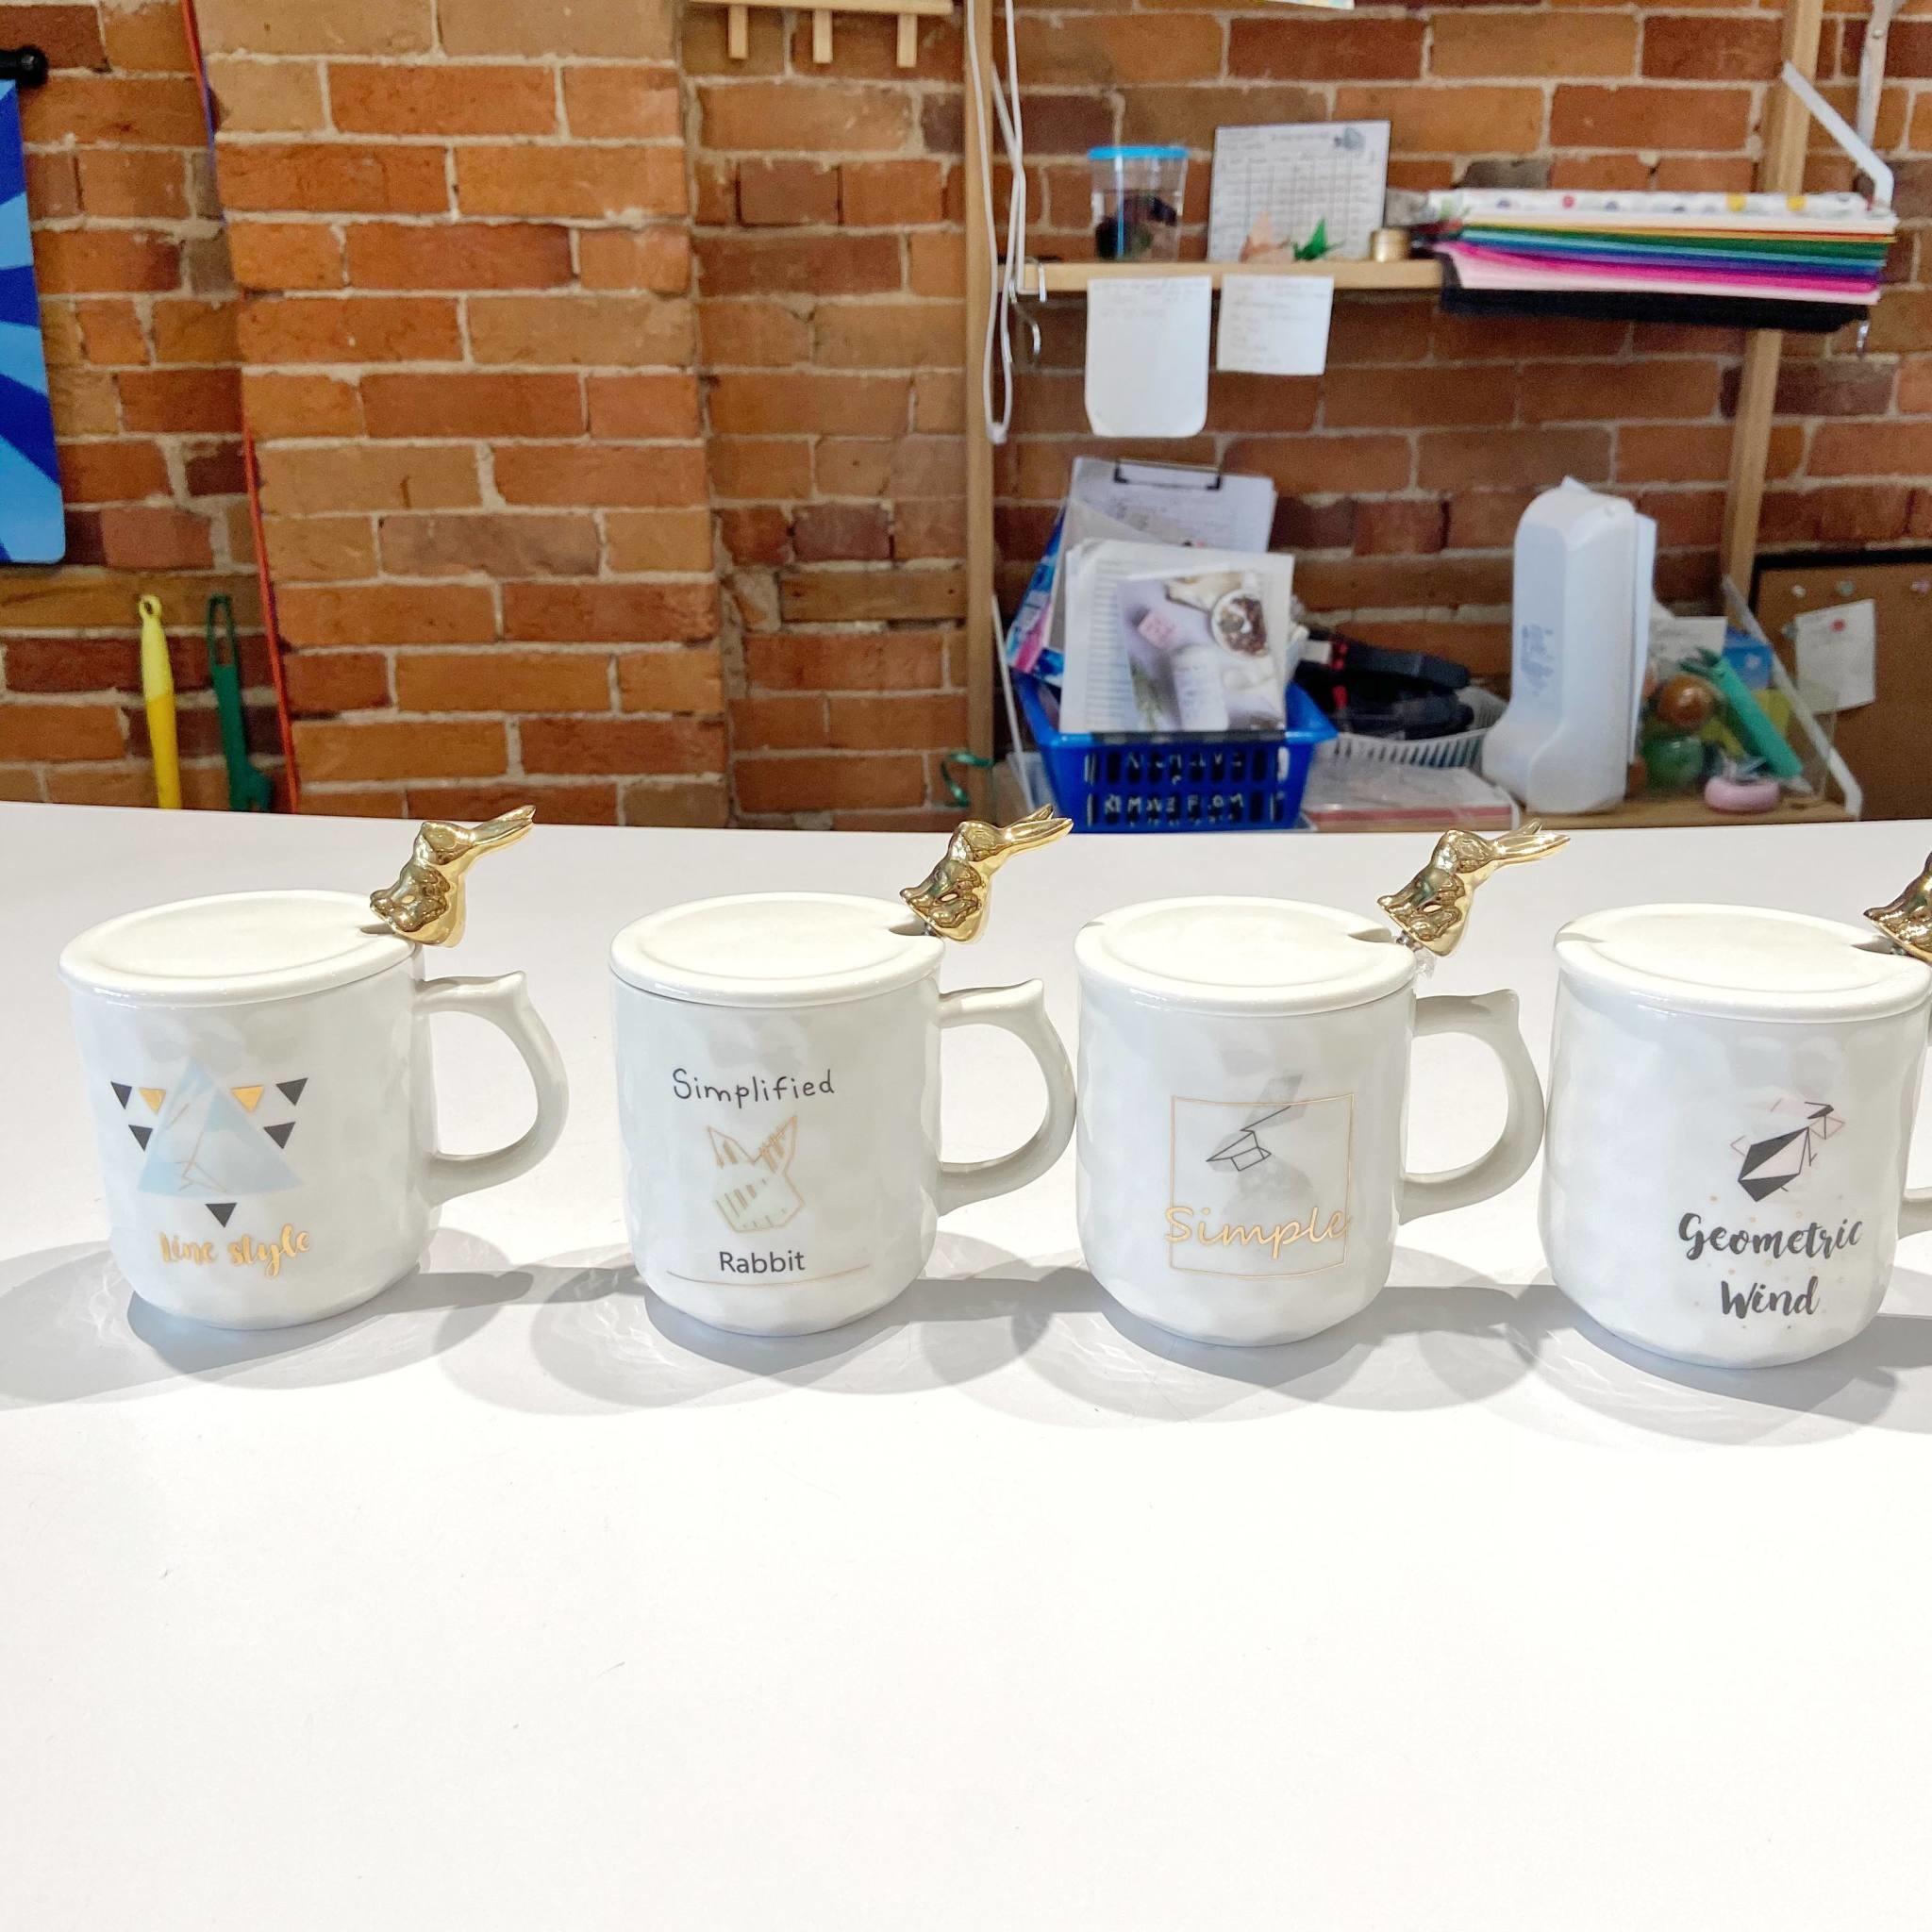 HD389-4 Simplified Rabbit Mugs